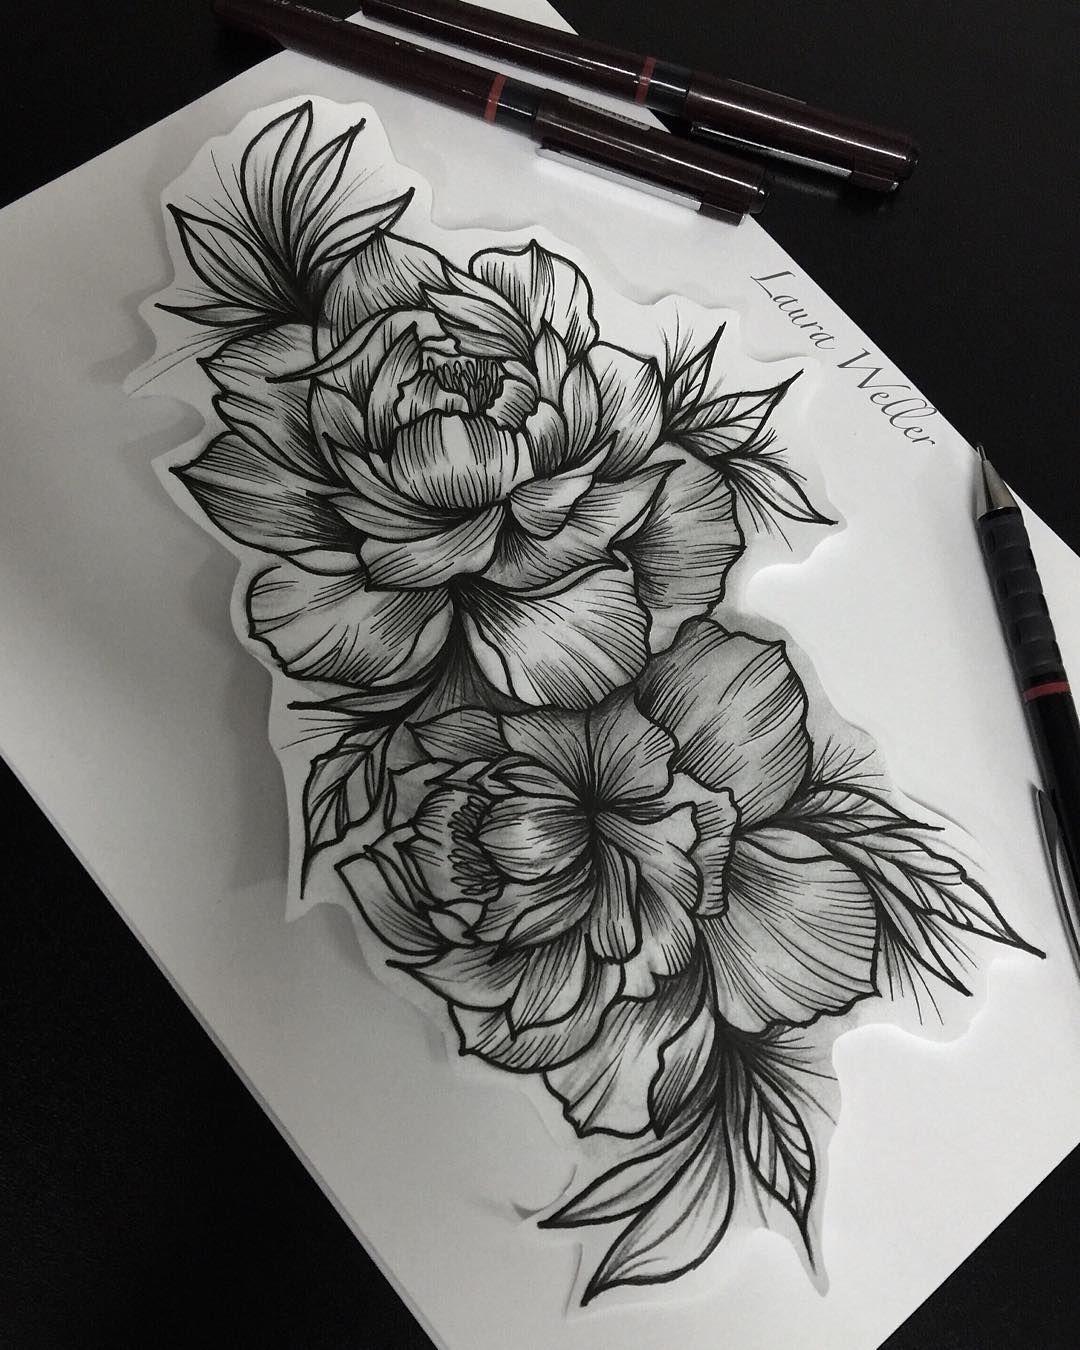 Sketch Tattoo Ideas Pinterest: Pin By Kyley Lavigne On TATS